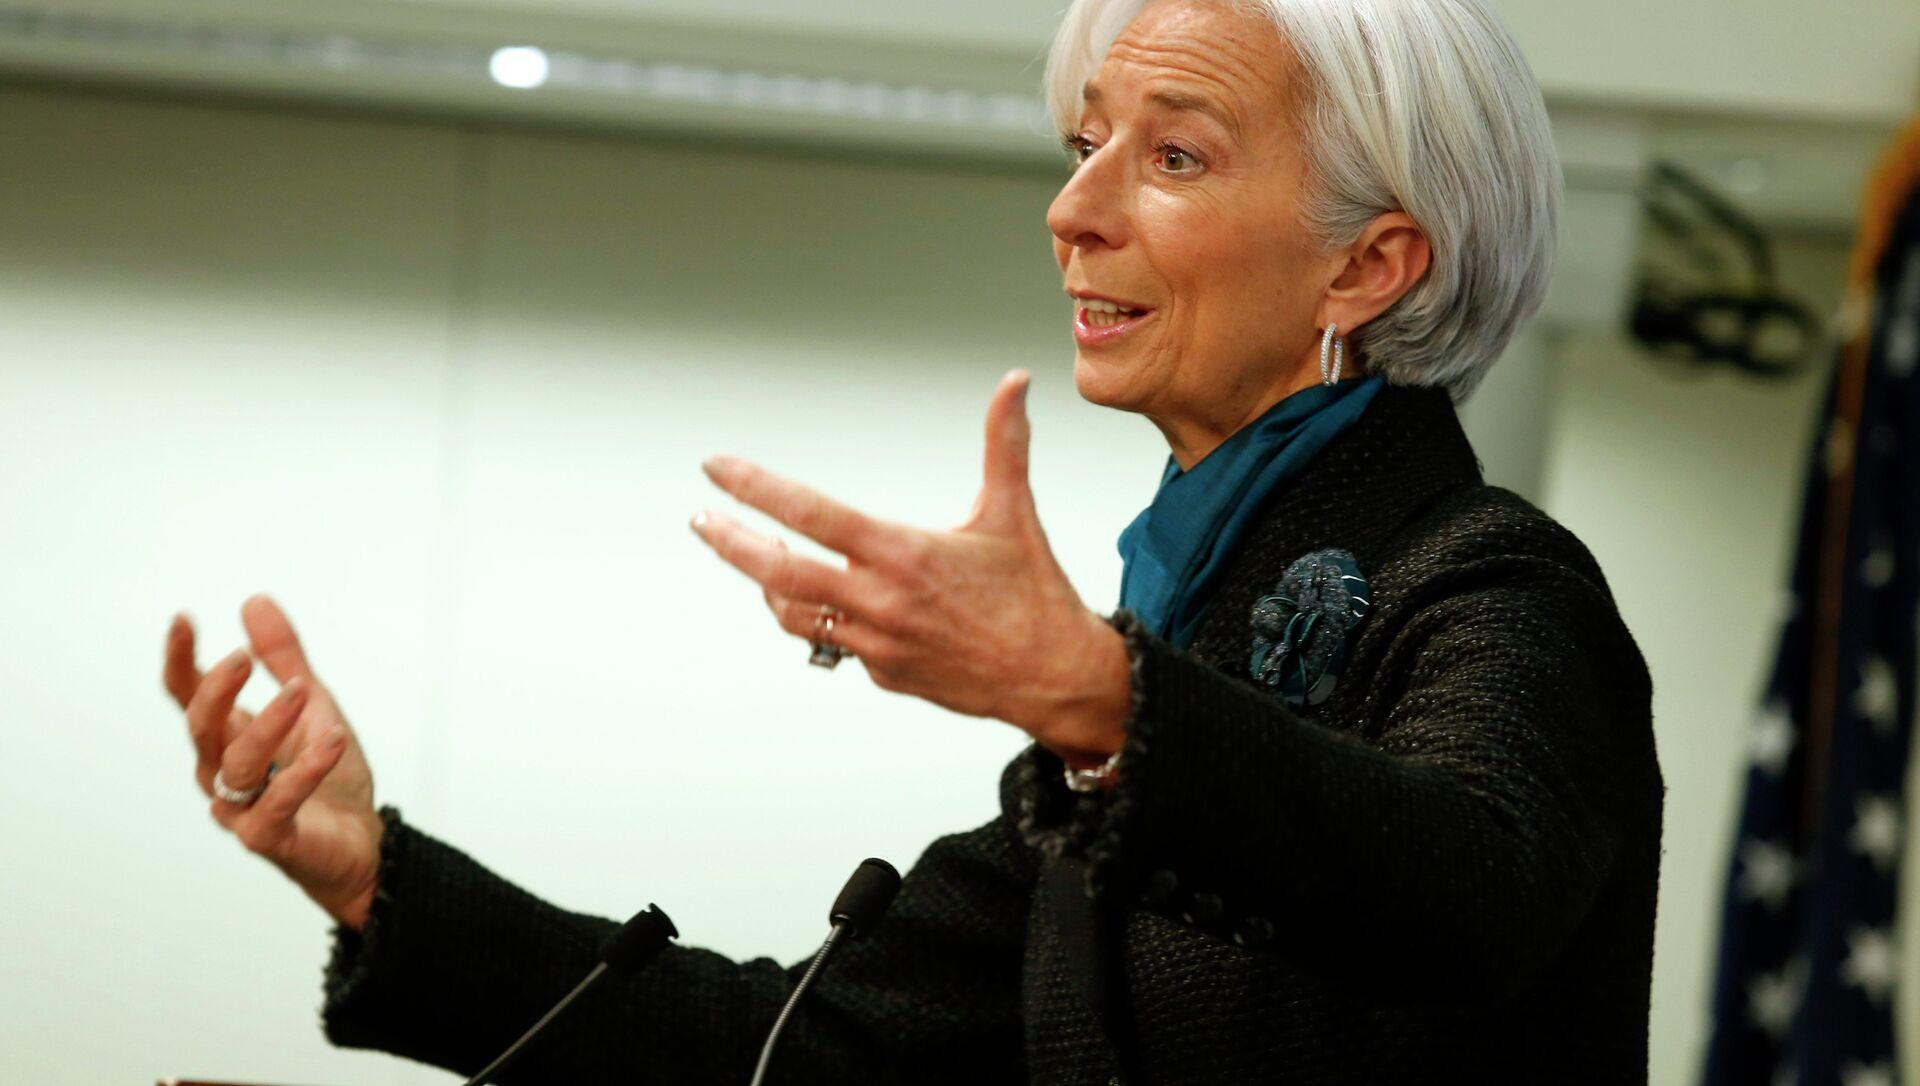 Christine Lagarde, ex direttore Fmi e nuovo presidente Bce - Sputnik Italia, 1920, 10.04.2021